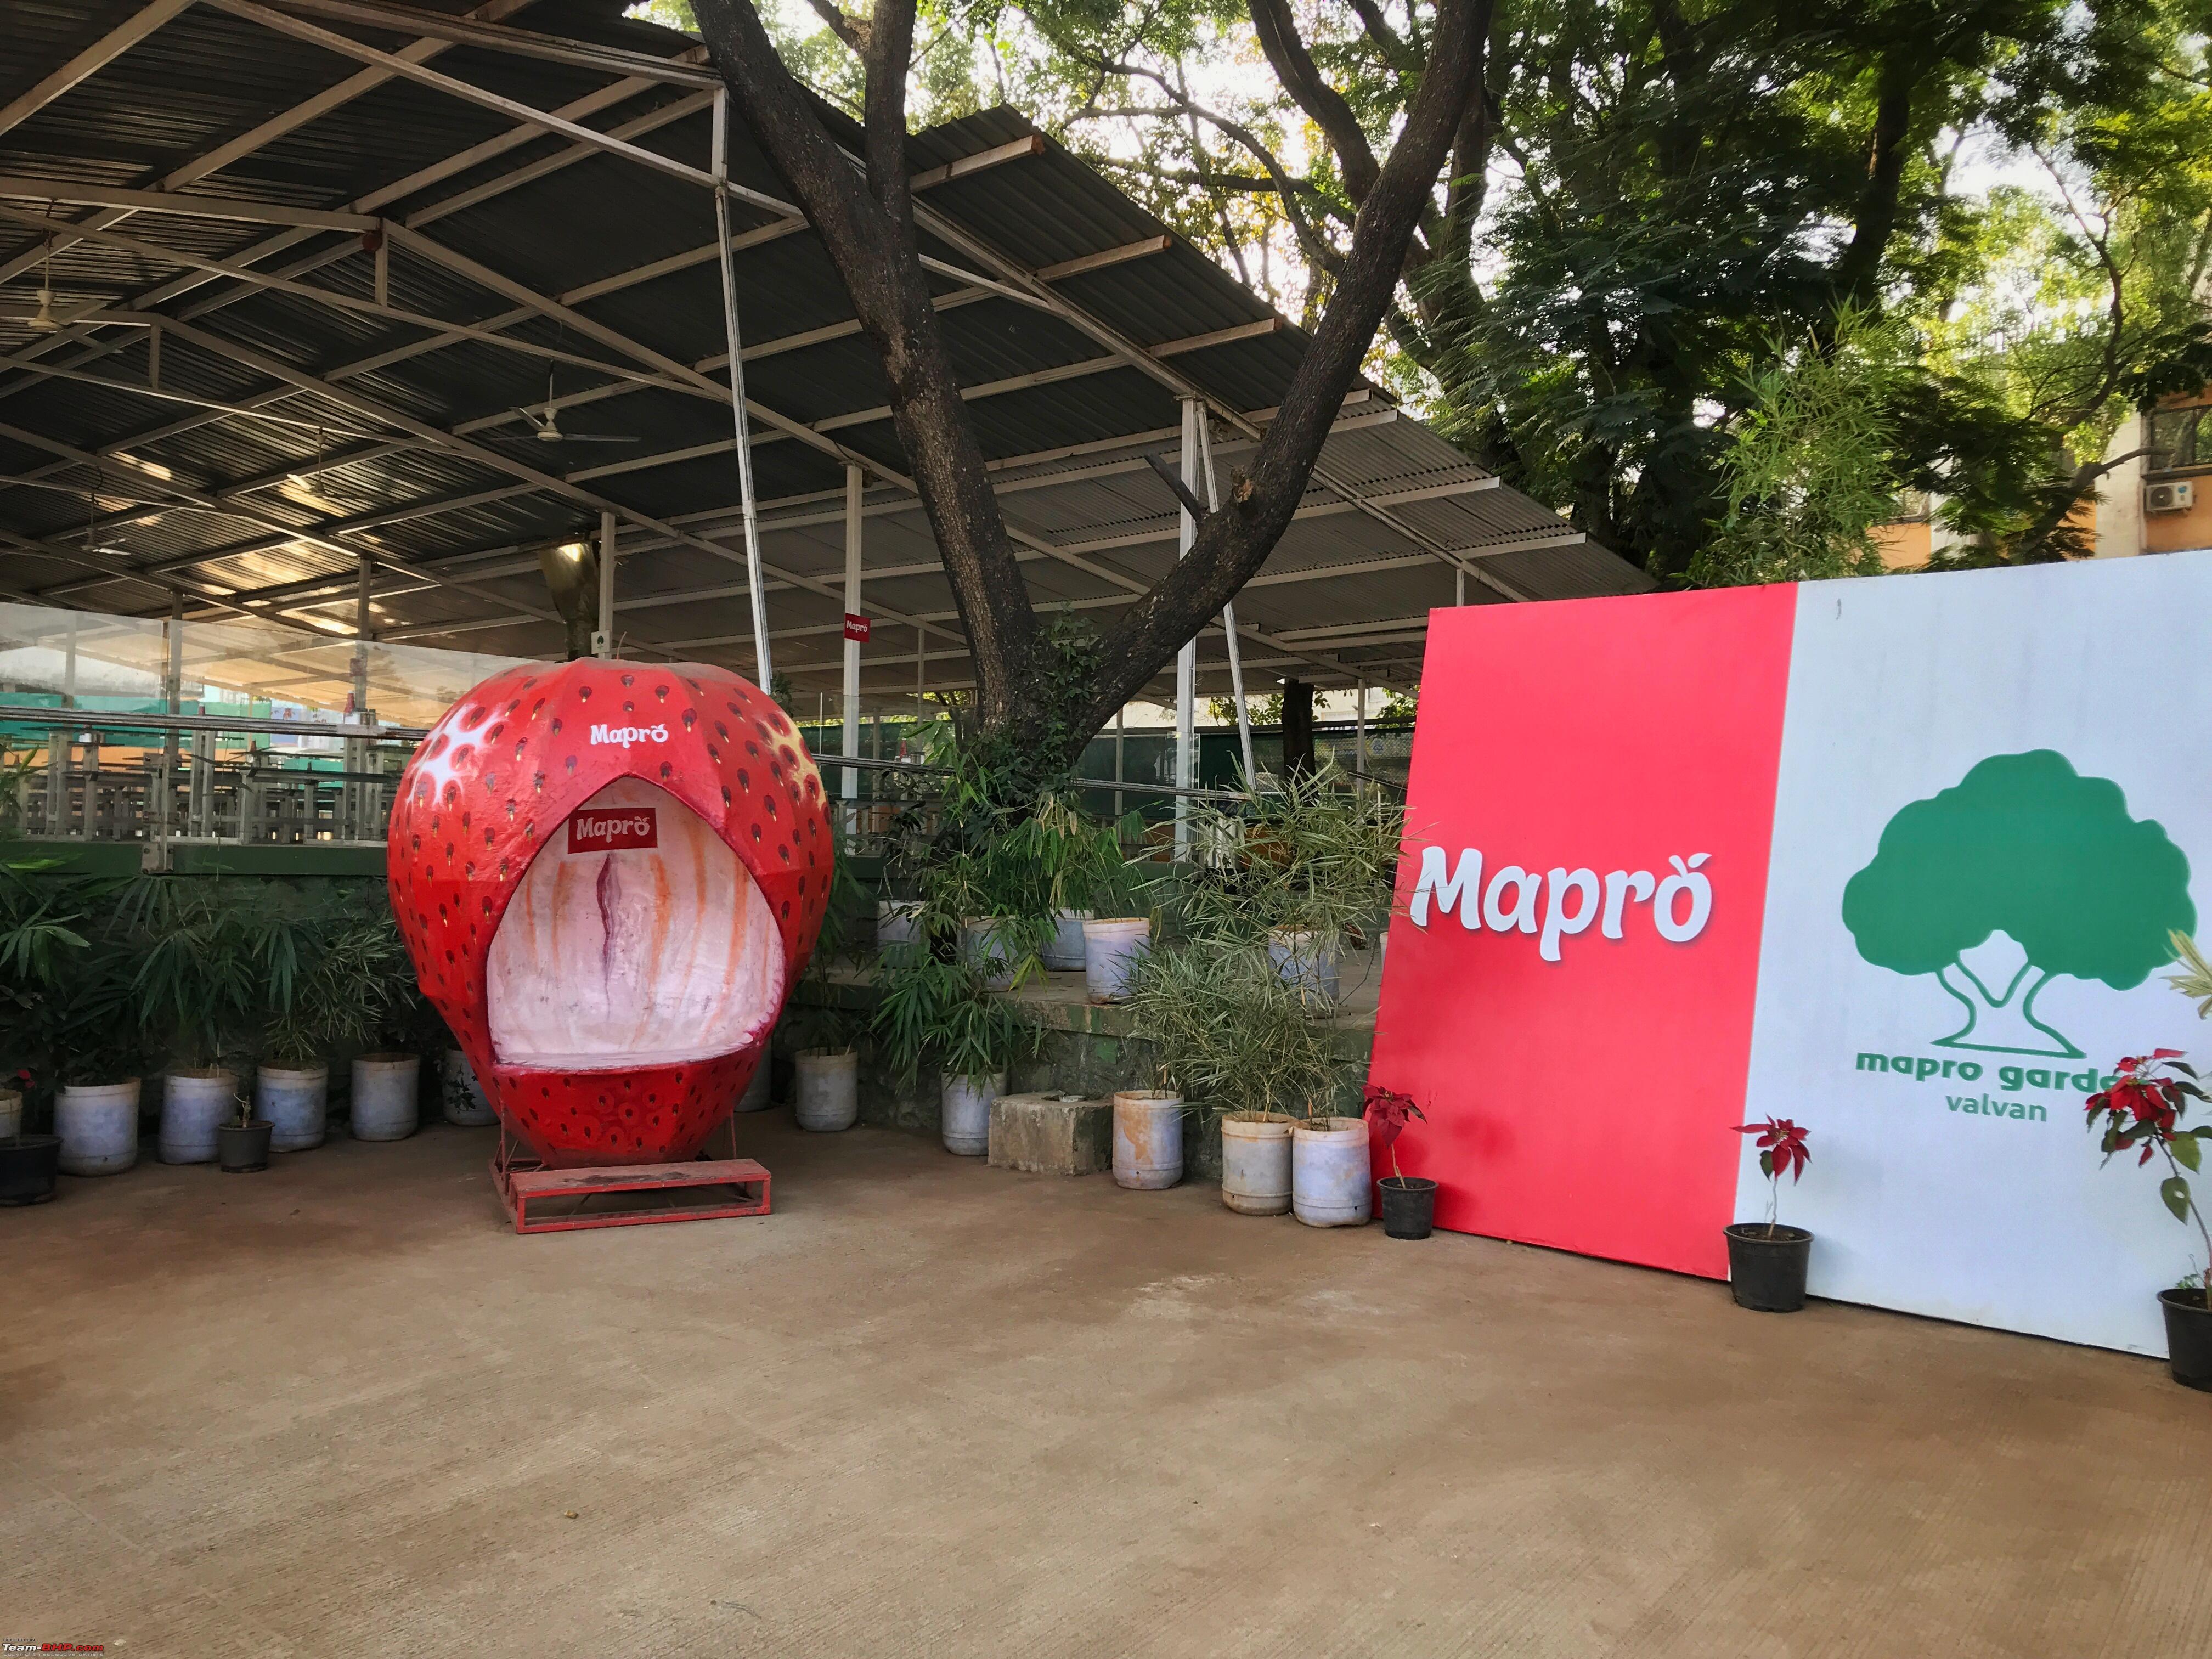 Mumbai Pune Breakfast Drive To Mapro Garden Lonavala Sun 19th Jan 2020 Page 4 Team Bhp